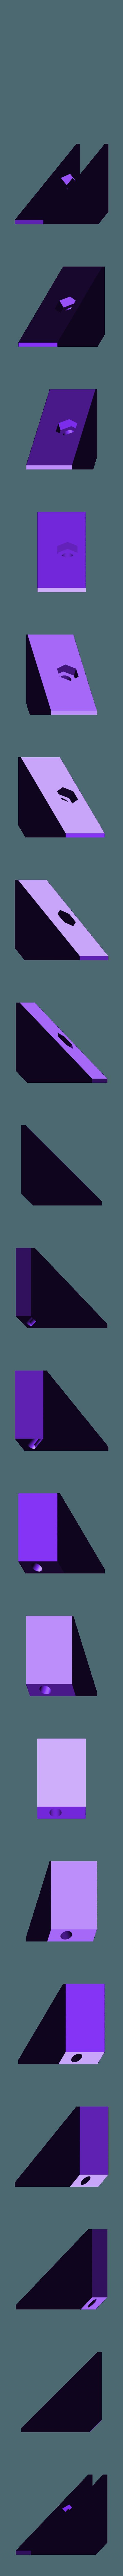 corner_wedge.stl Download free STL file FDM Printer de Kleine Reus 300x300x900 • 3D printable object, Job